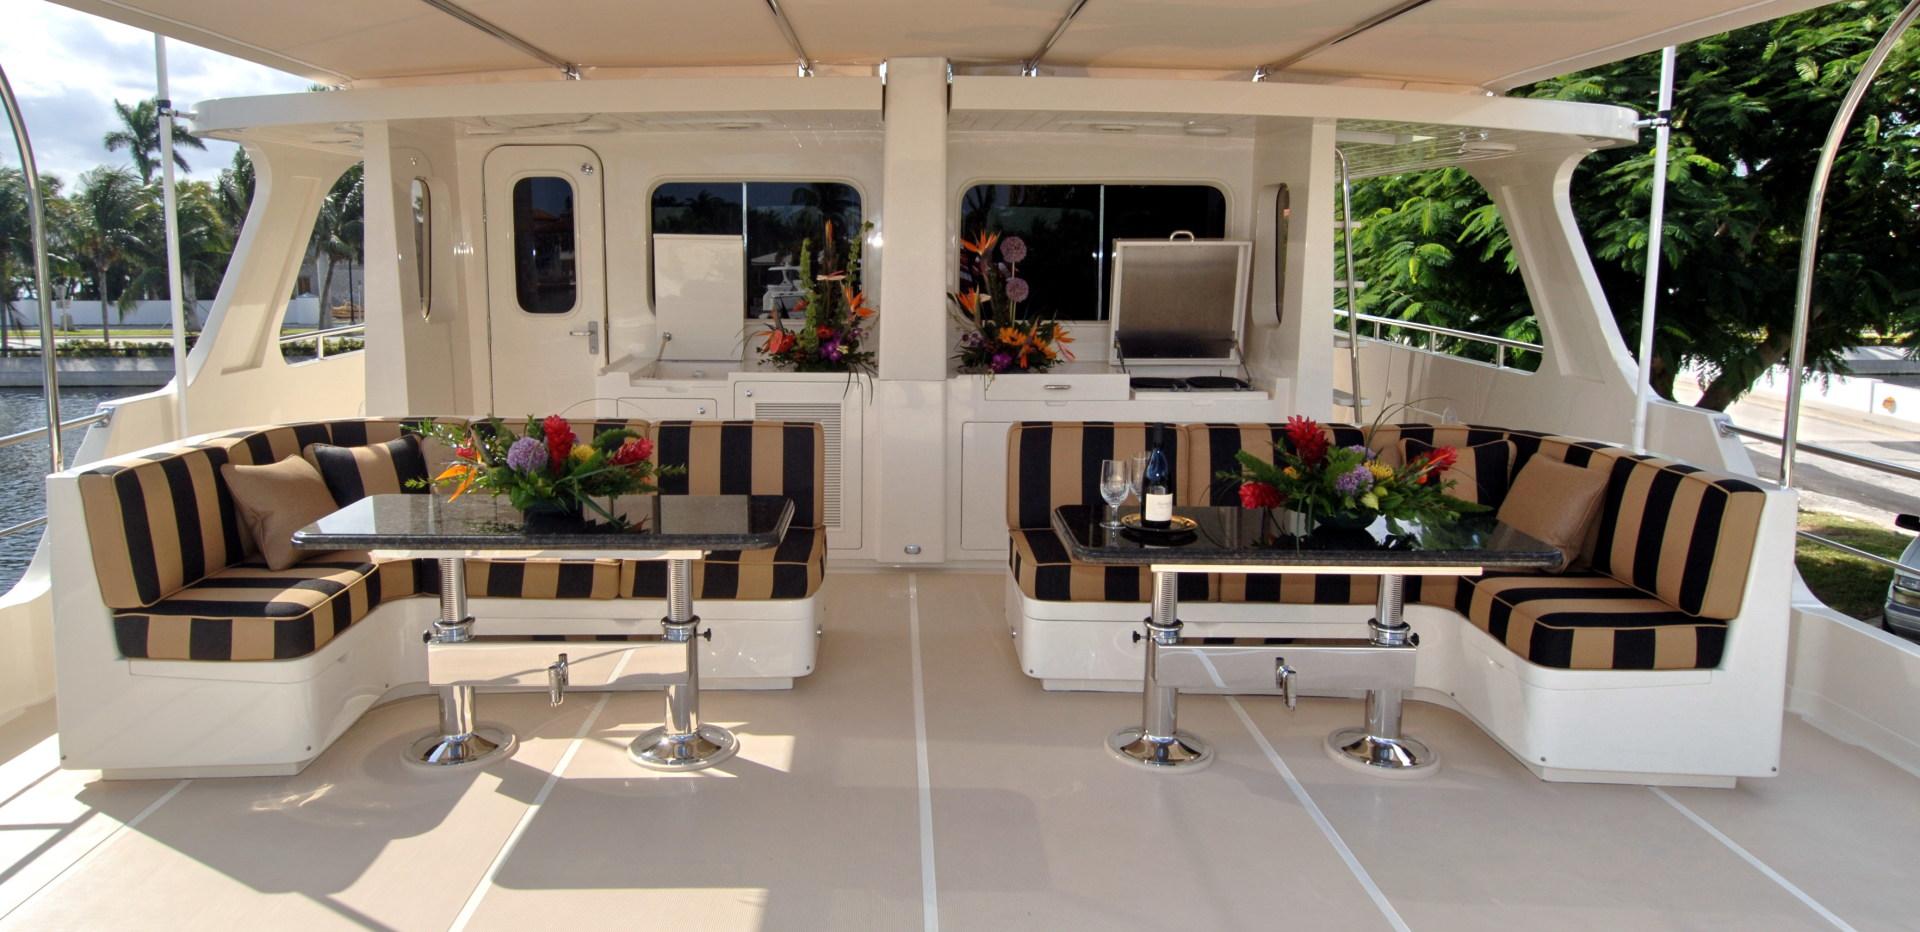 Offshore Yachts-Motoryacht 2020 -United States-1117778   Thumbnail